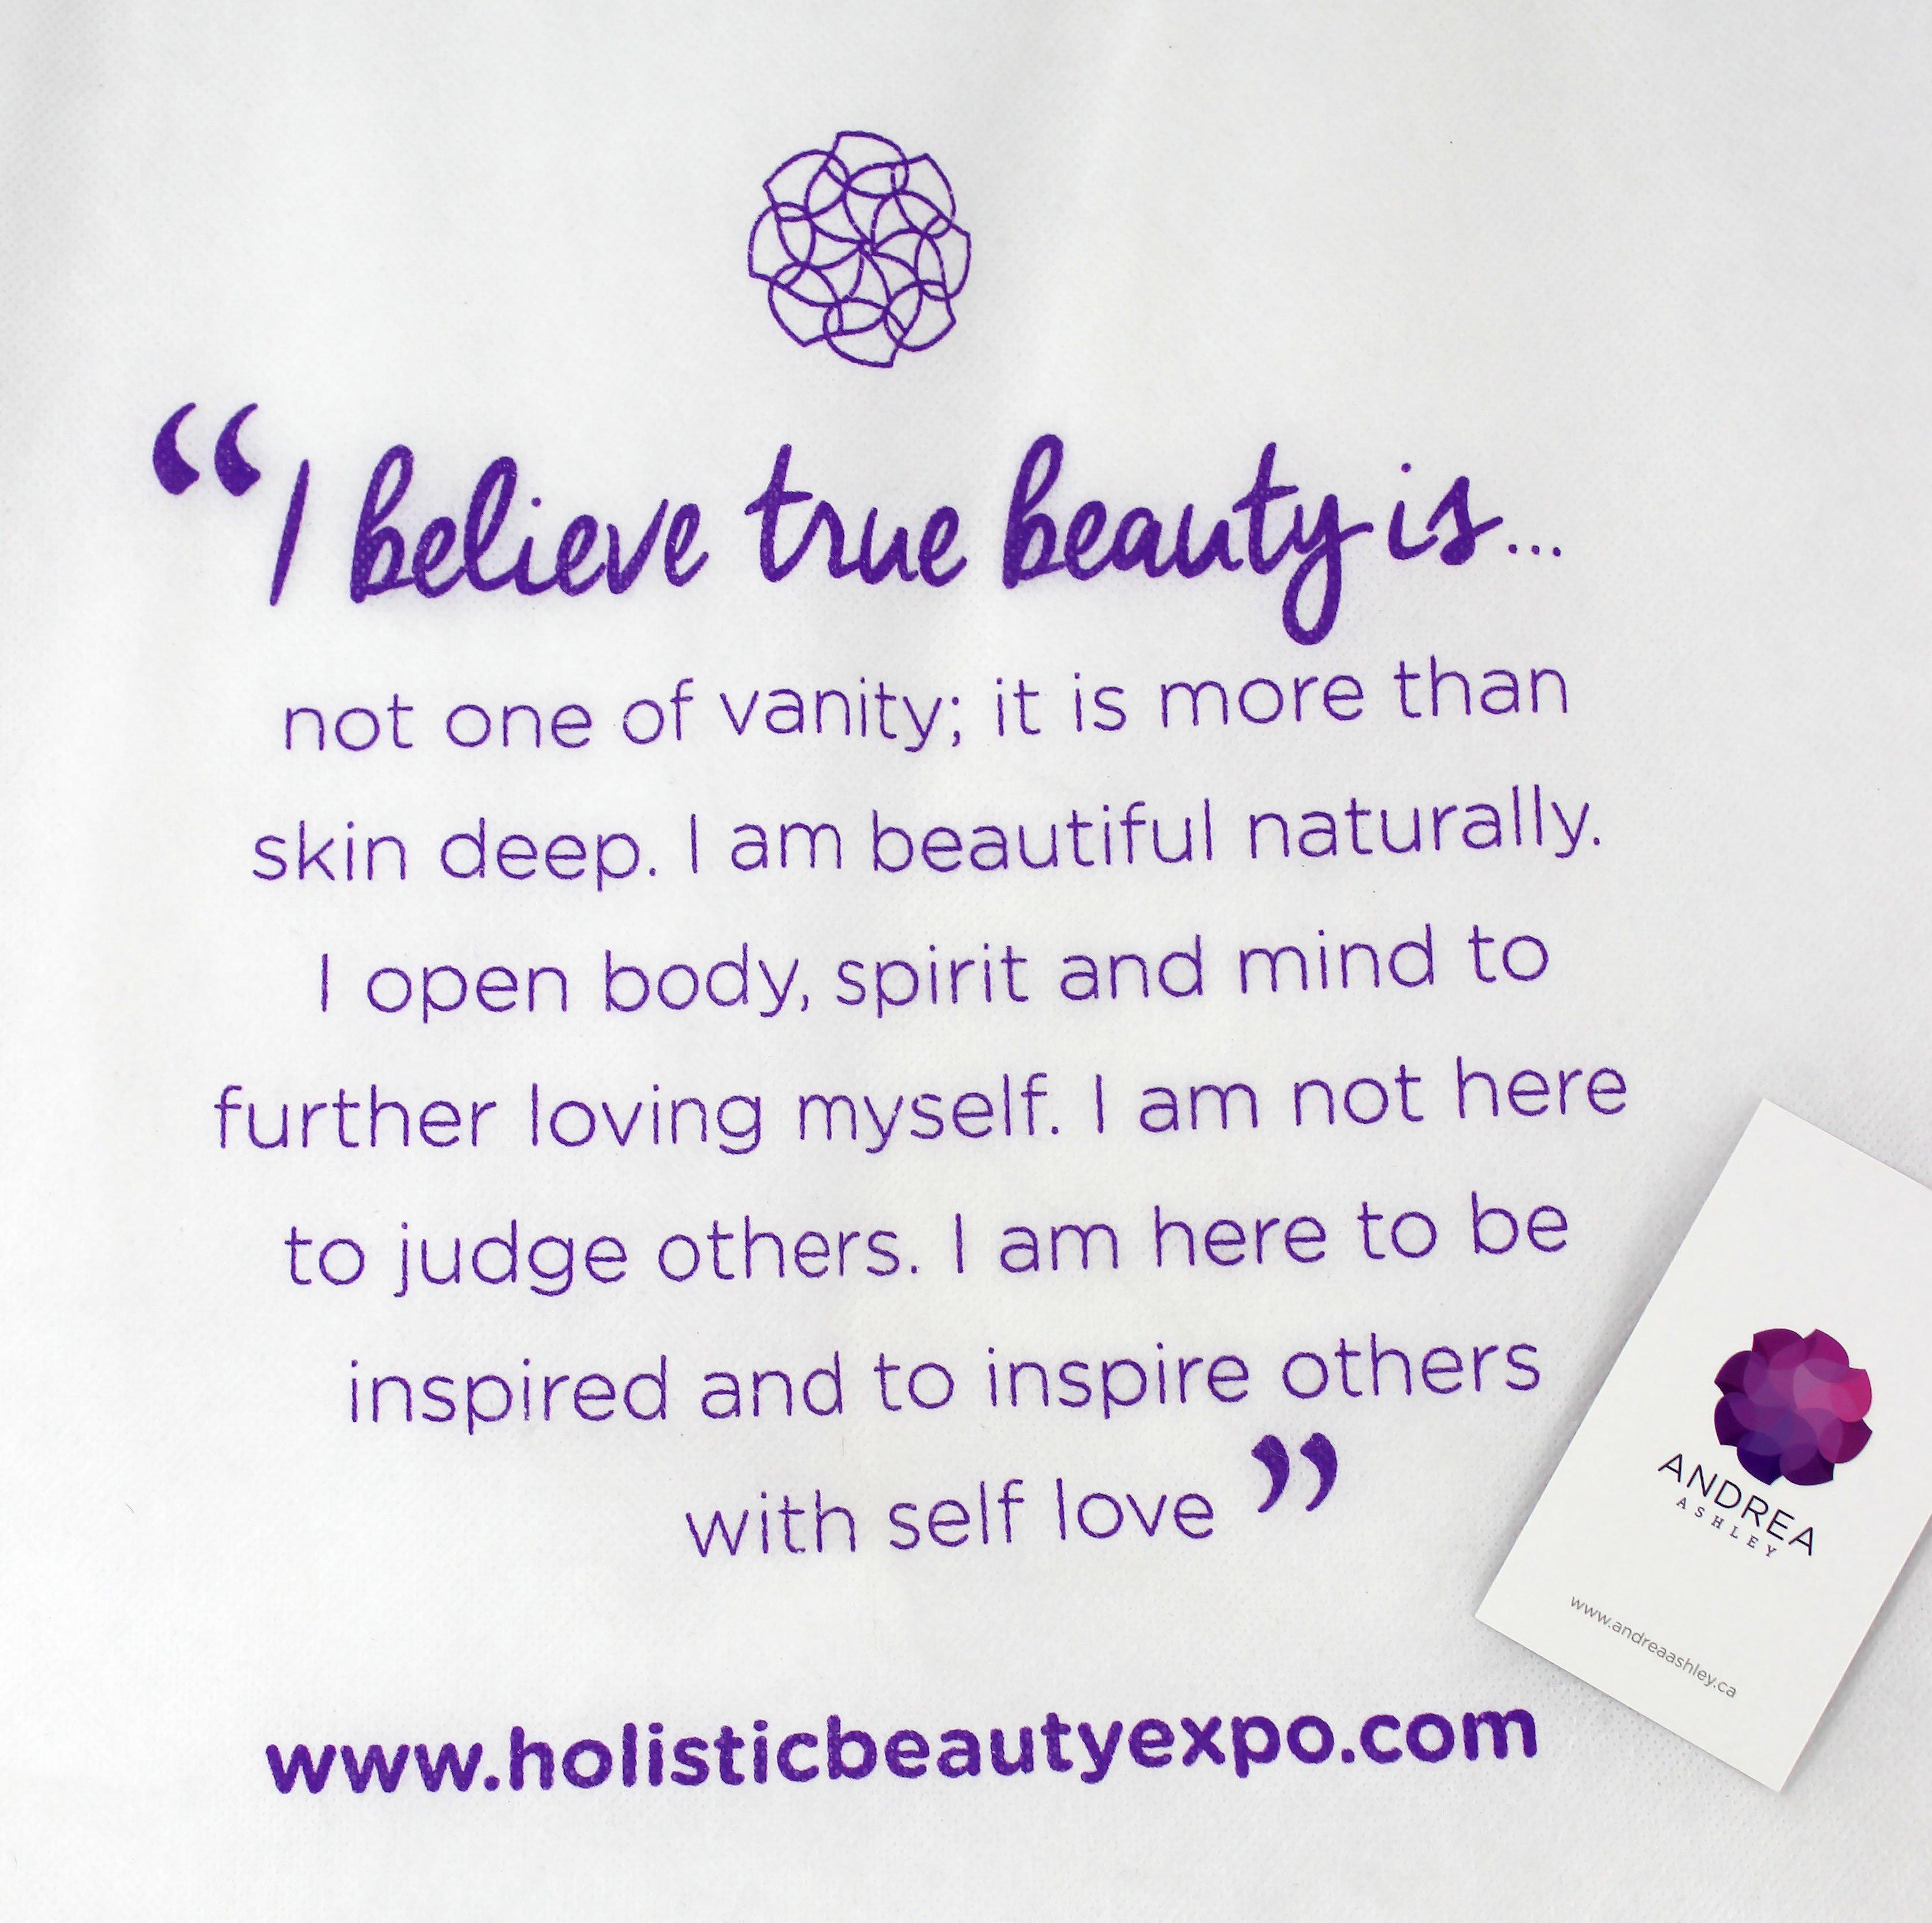 holistic beauty expo